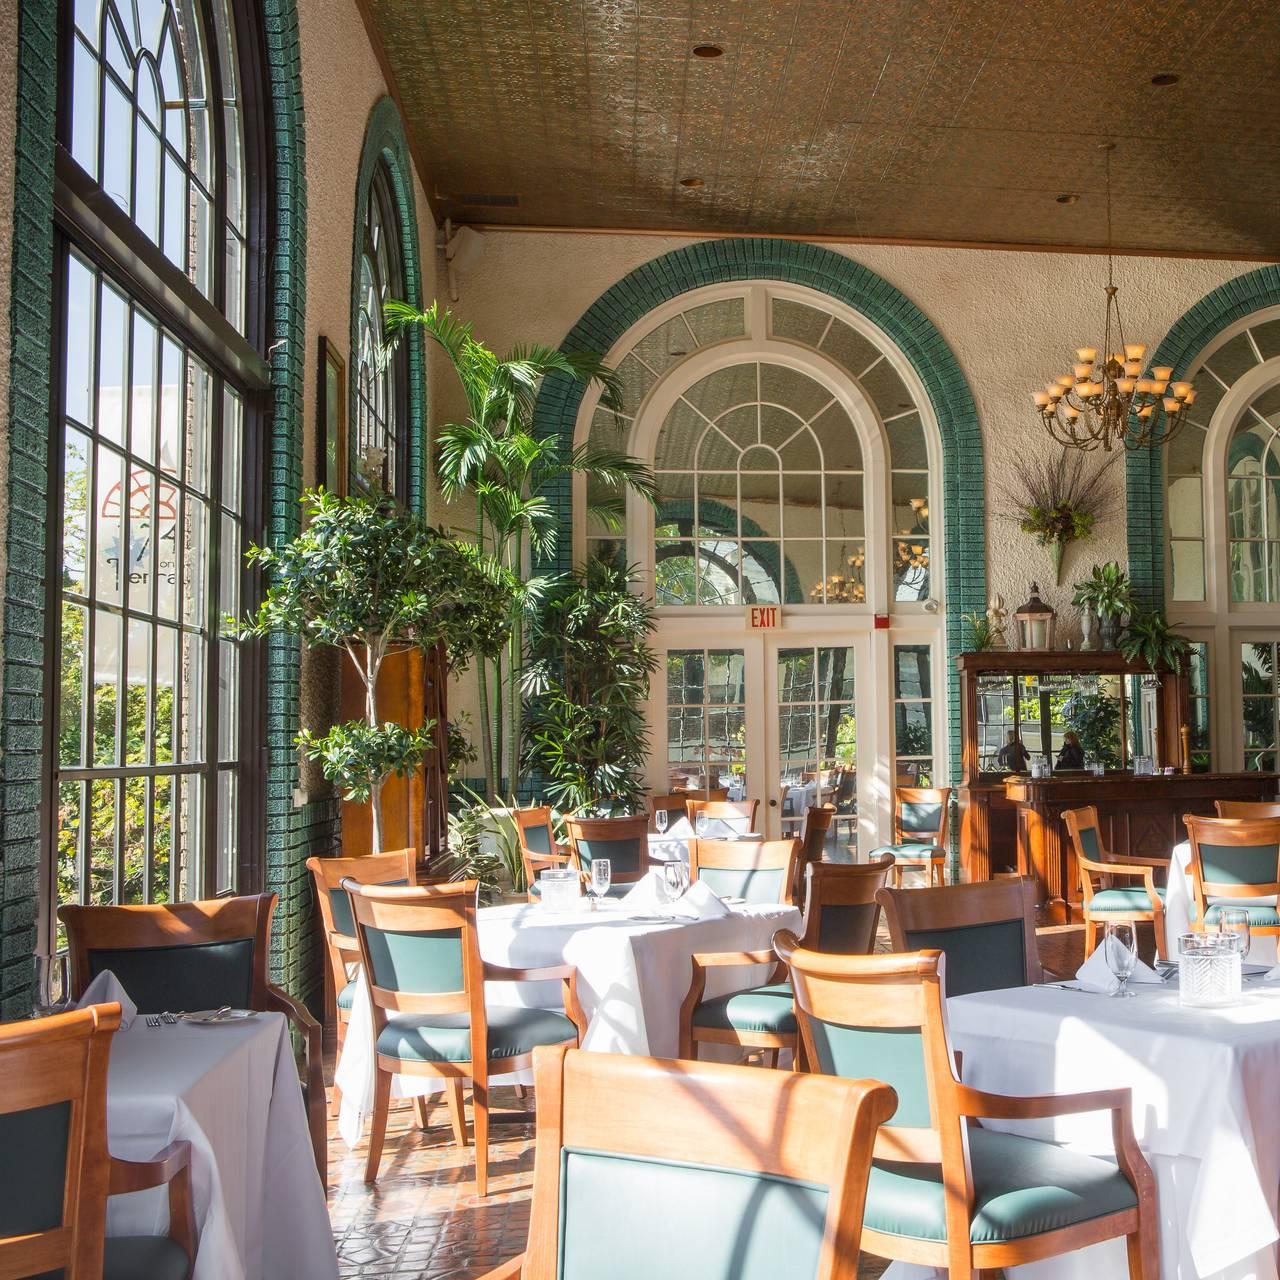 1741 Terrace - Hotel Bethlehem Restaurant - Bethlehem, PA